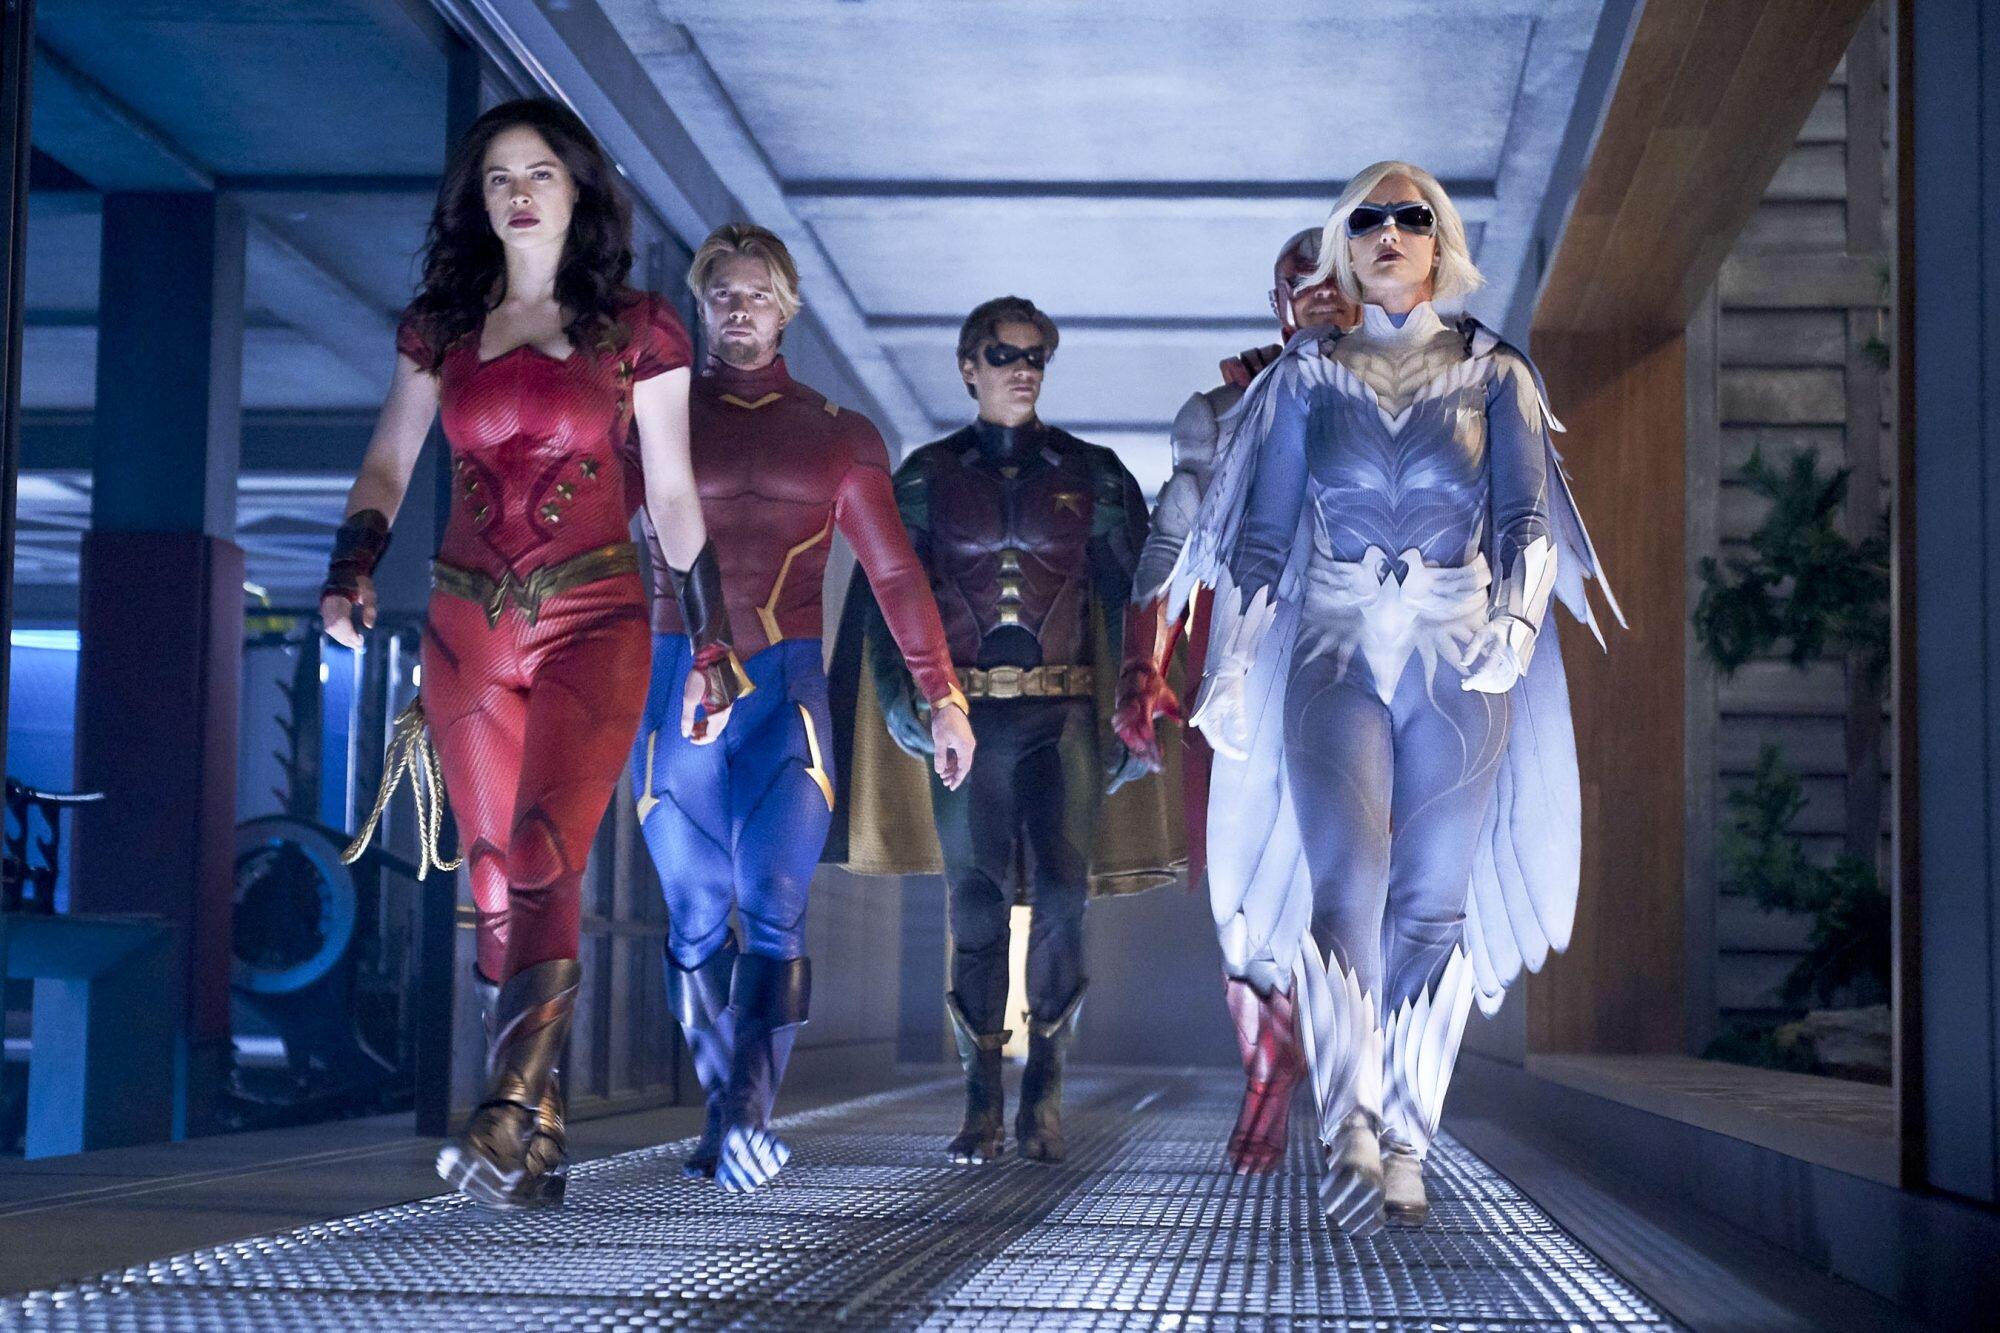 Titans renewed for season 3 on DC Universe